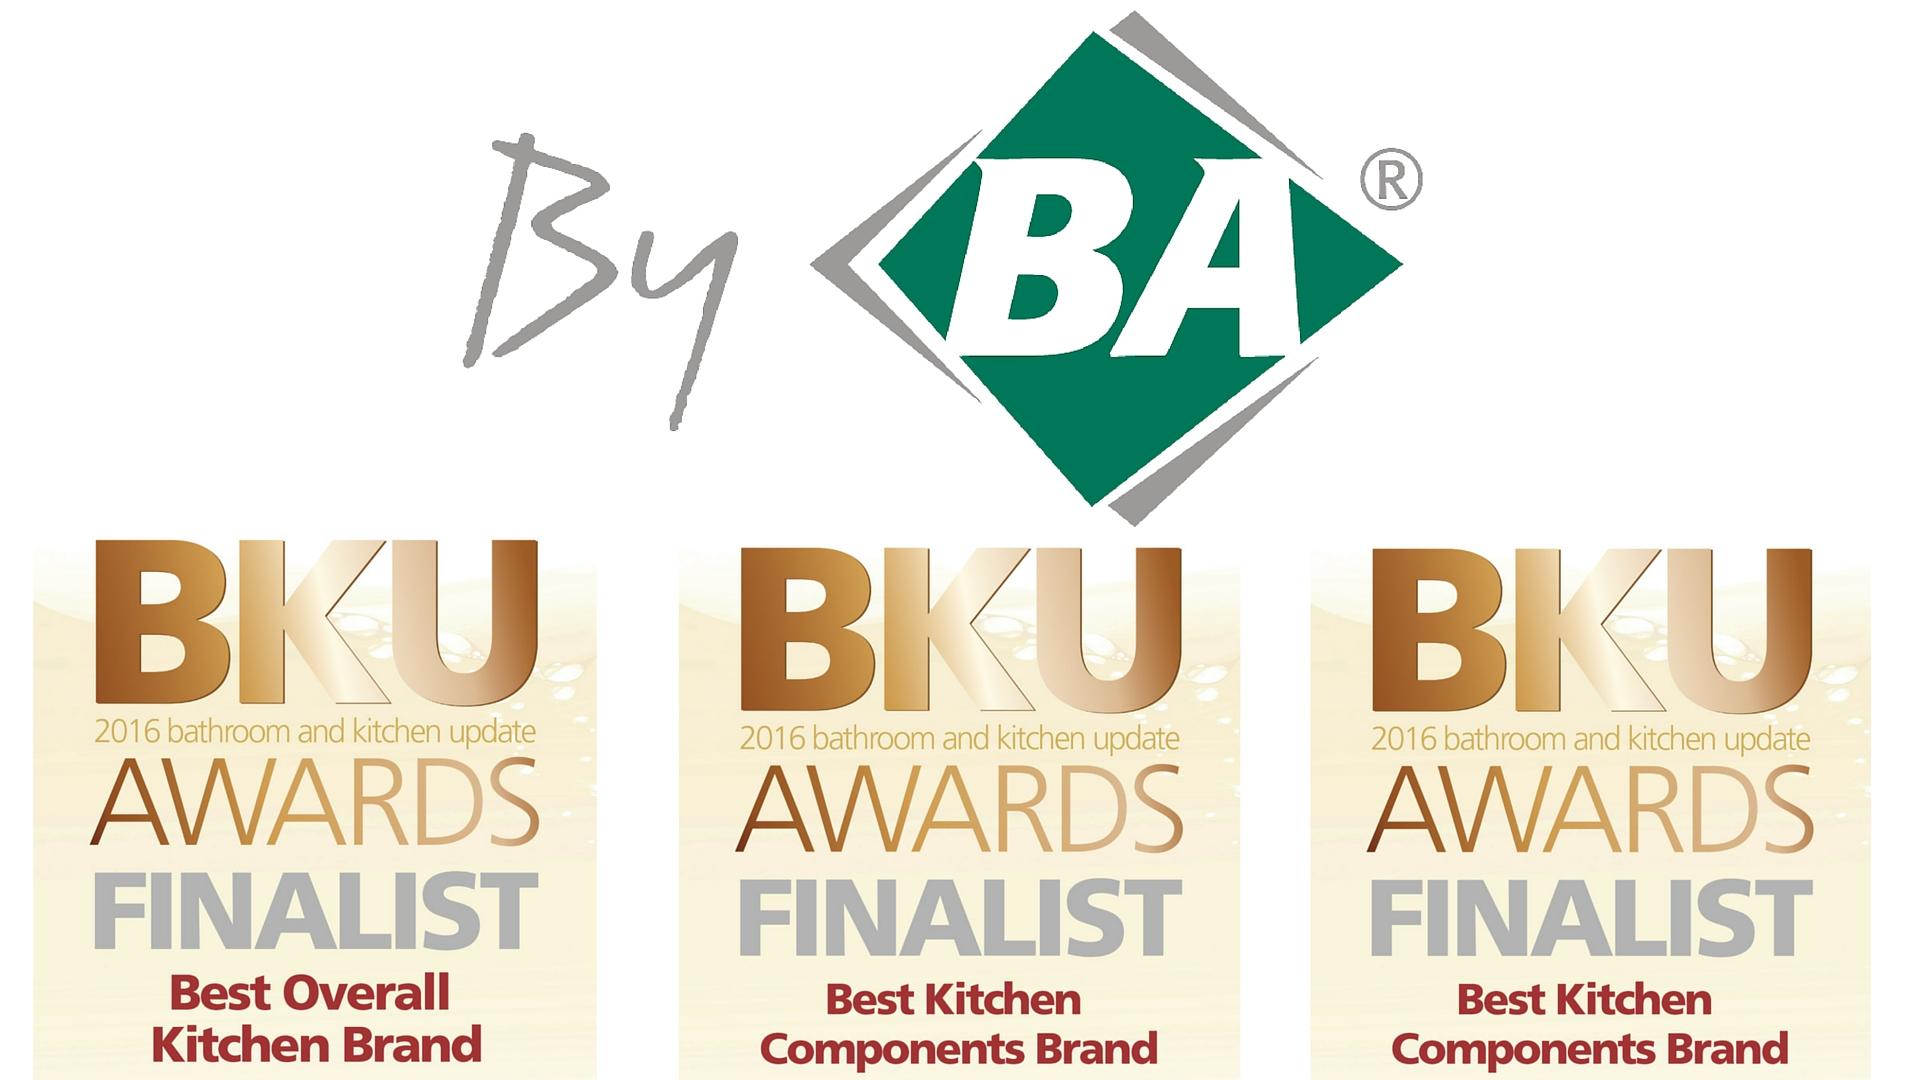 We've made the BKU Awards final….again!